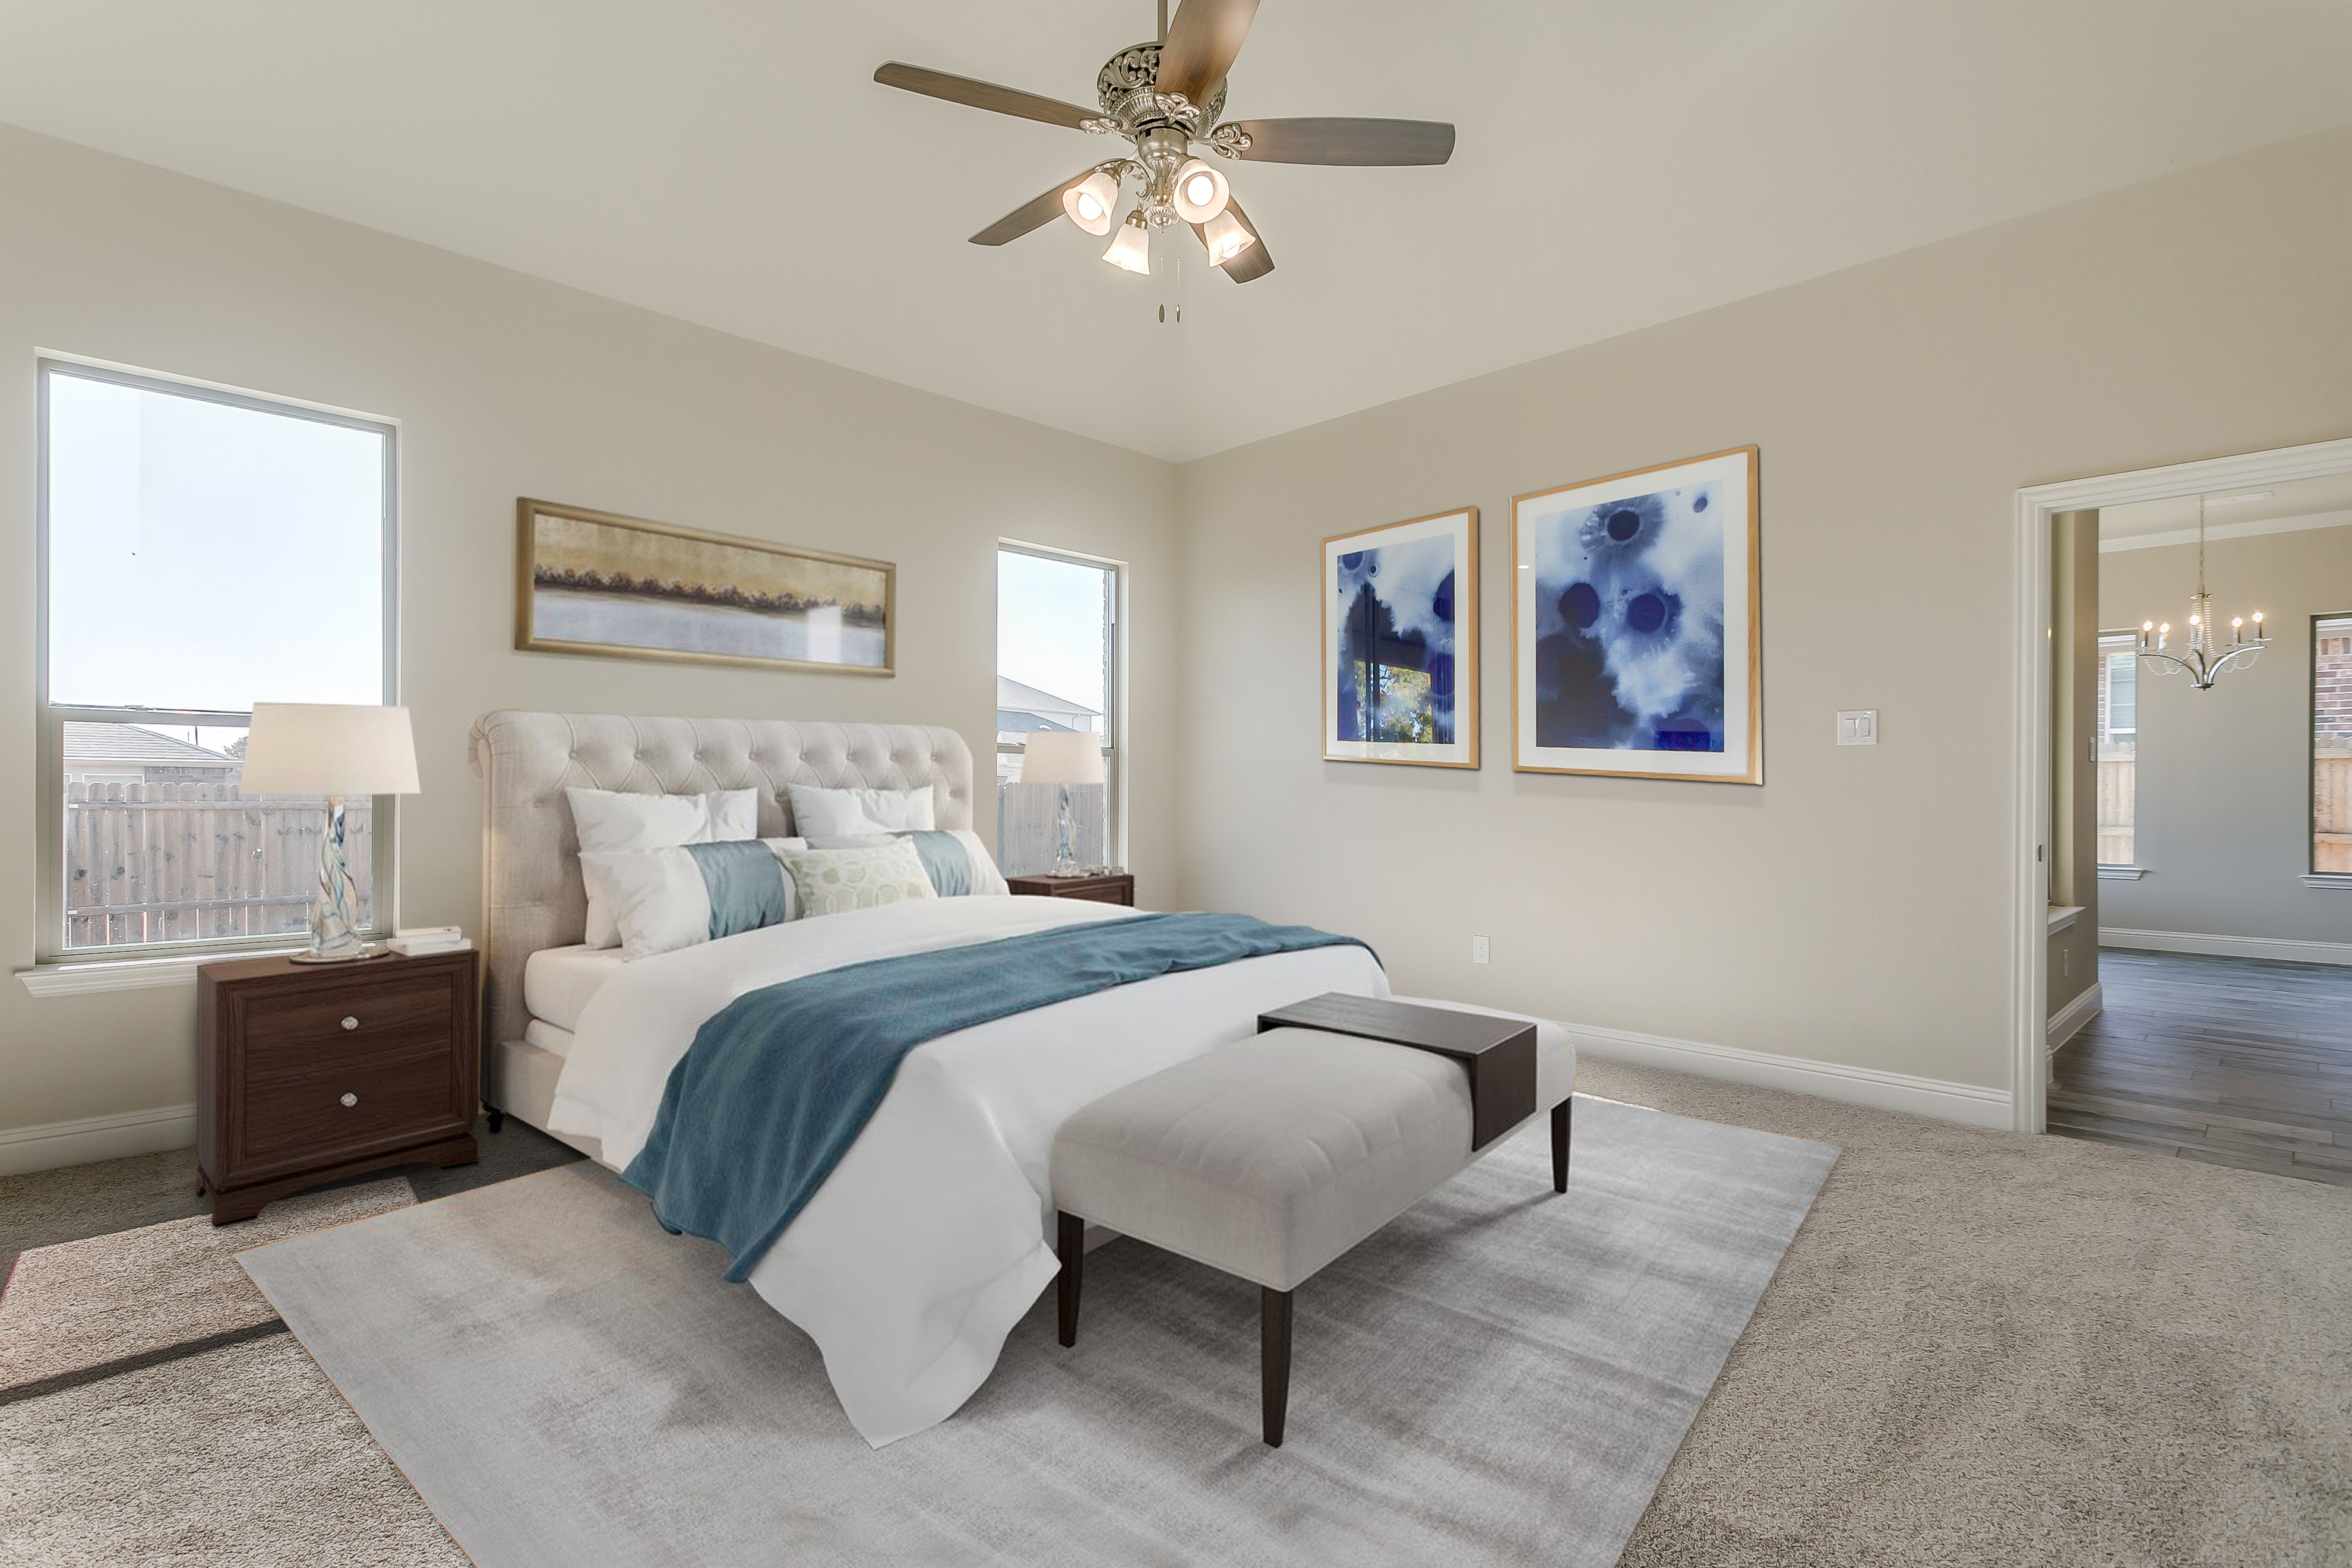 master bedroom 2 a